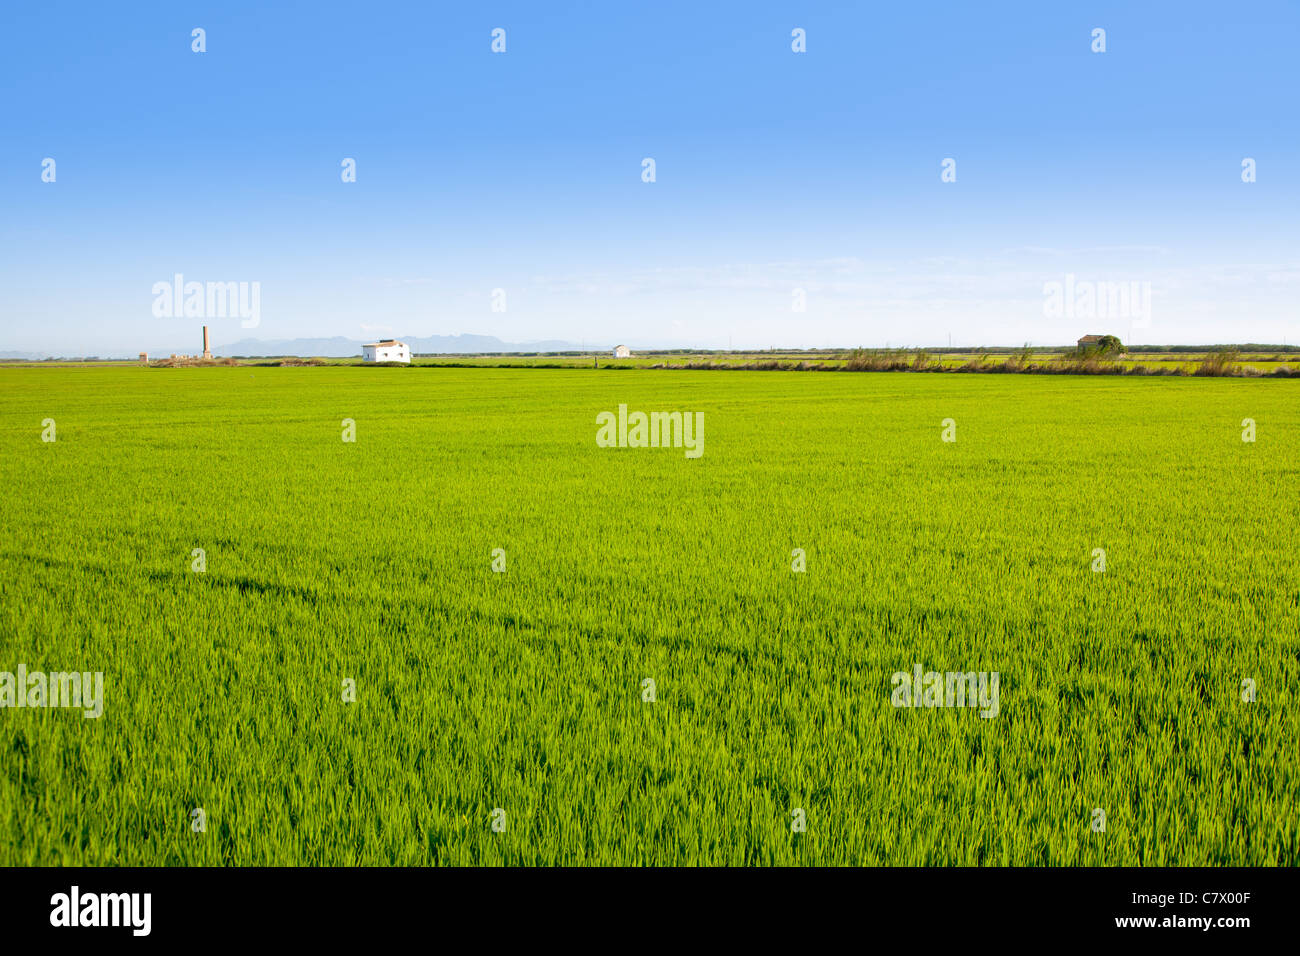 green grass rice field in Valencia El Saler Spain Stock Photo